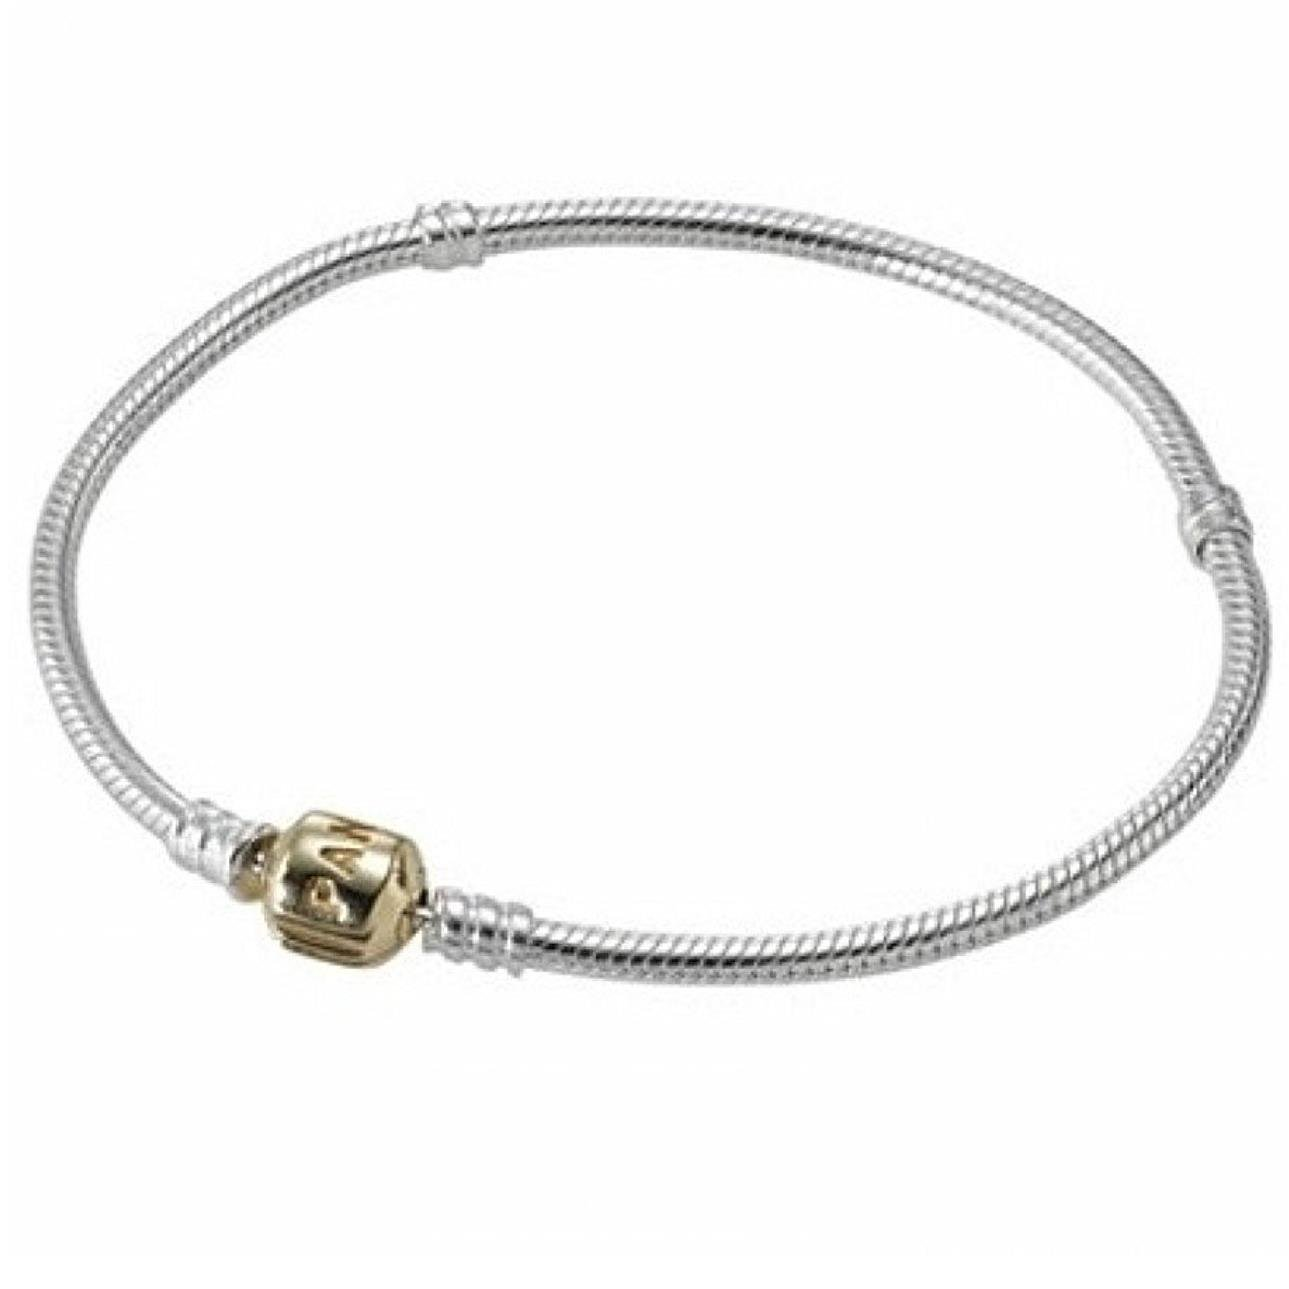 846e2b58b Amazon.com: Pandora Barrel Clasp Silver & Gold Bracelet 590702HG19: Strands  Of Beads: Jewelry